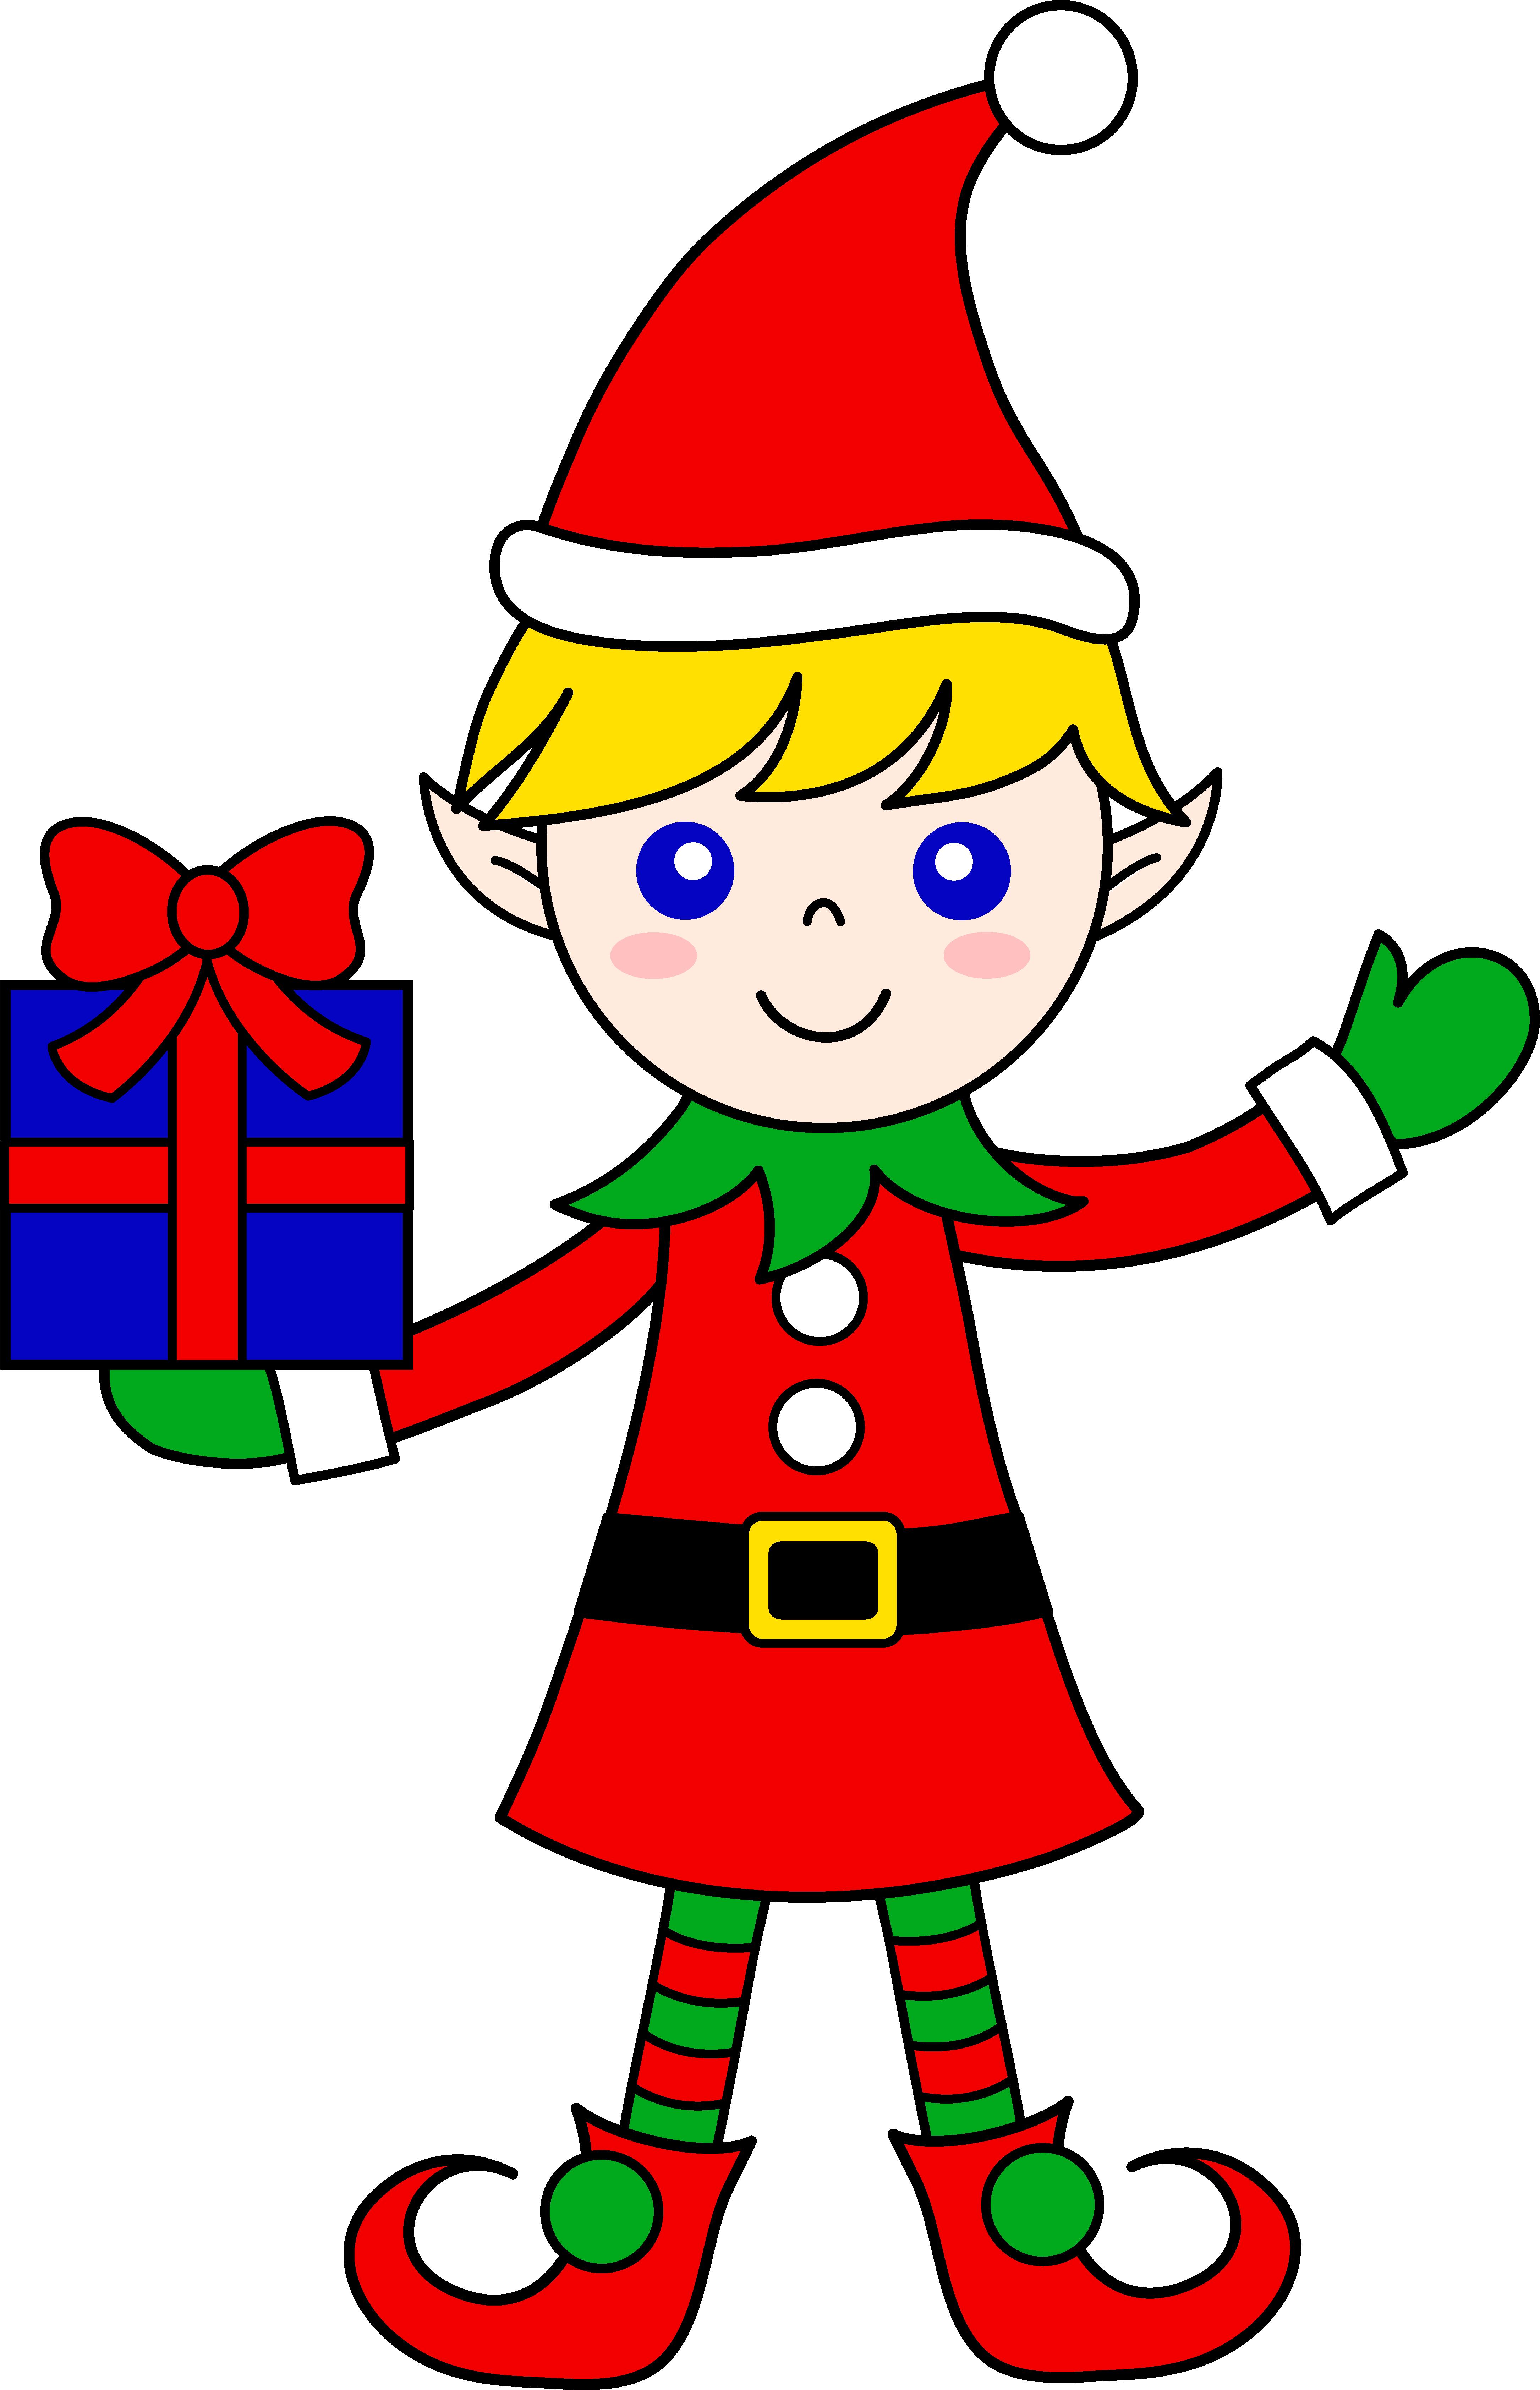 Cute Christmas Elf Clip Art